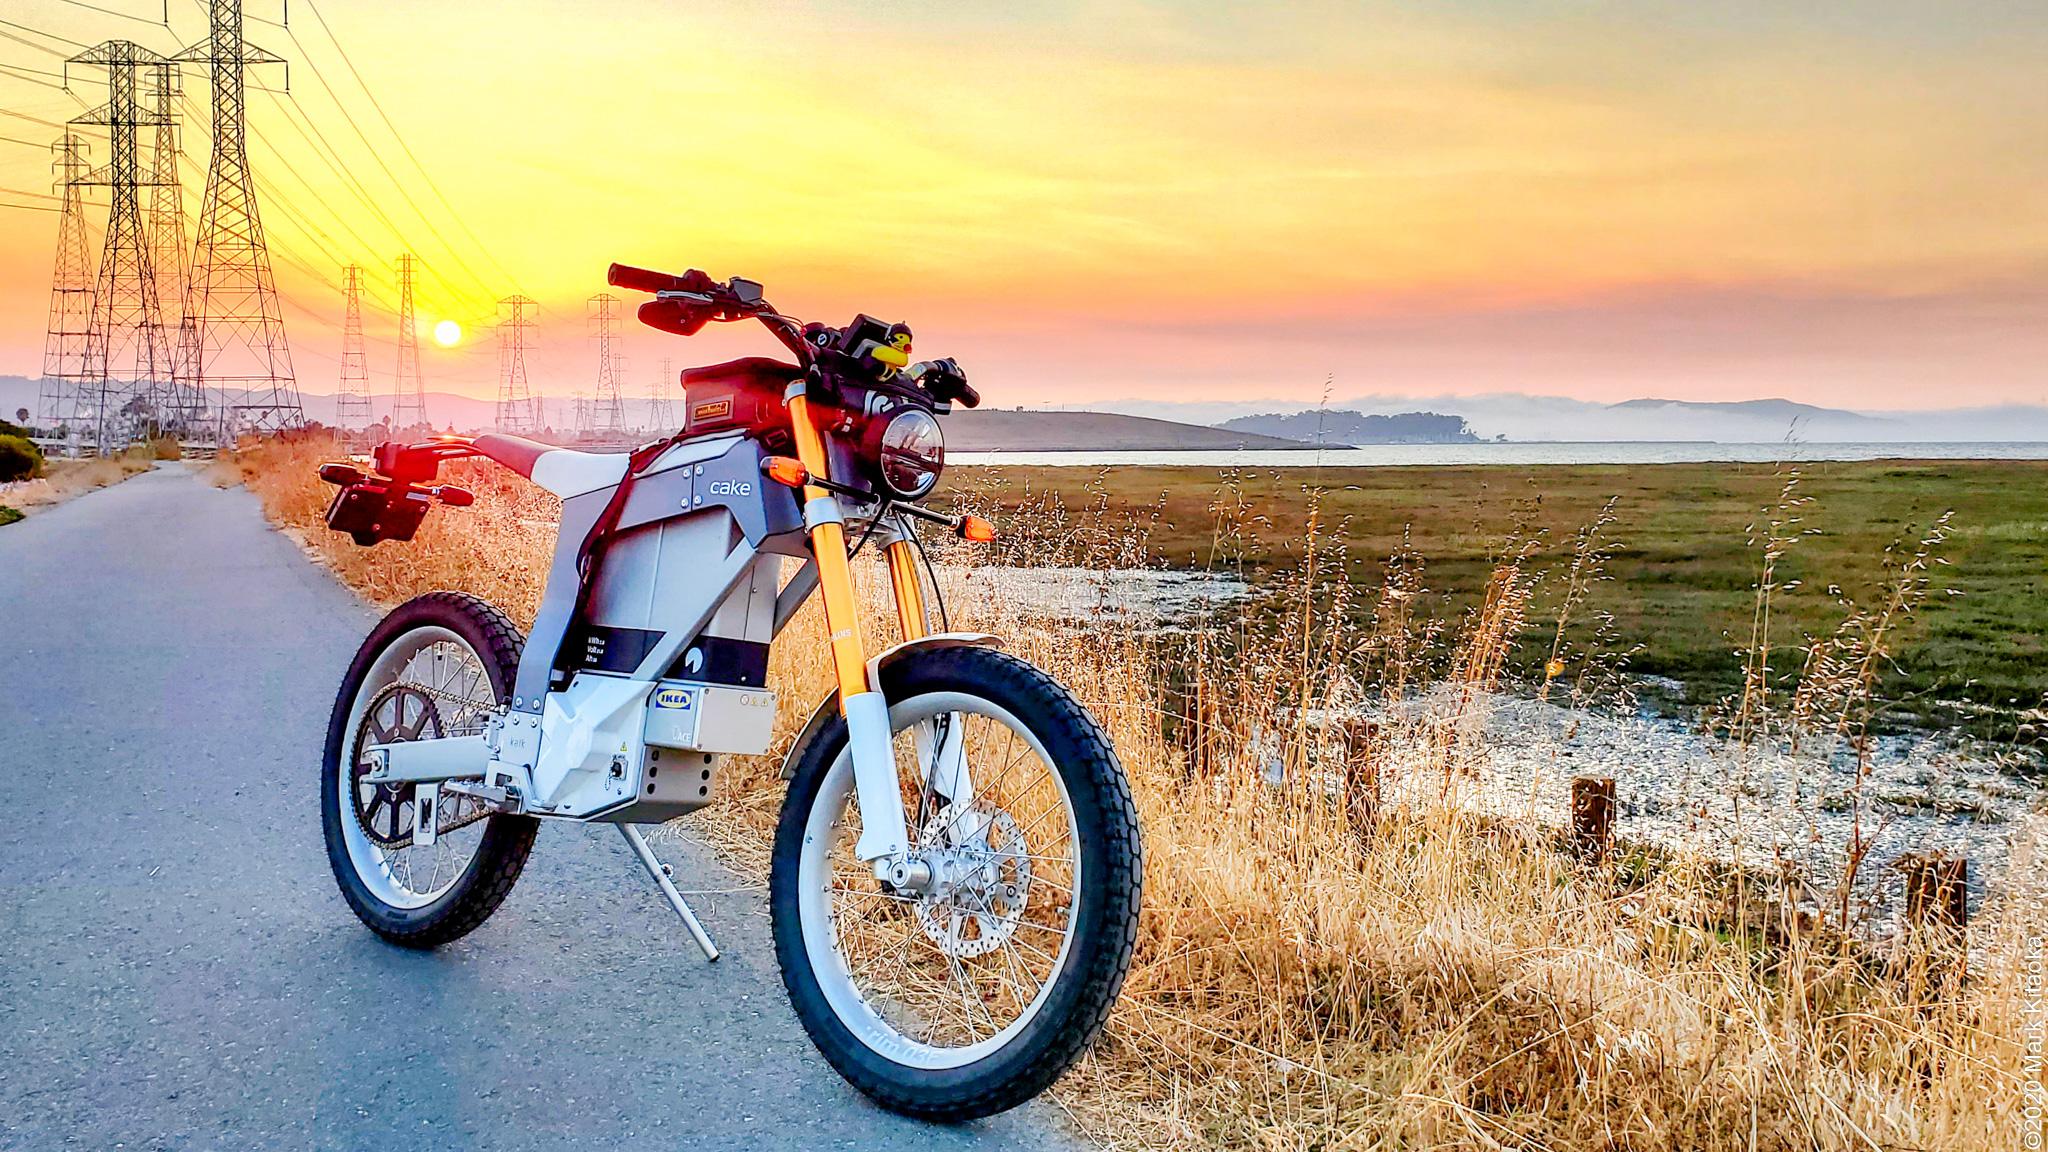 Cake Kalk Electric Motorcycle Review Webbikeworld